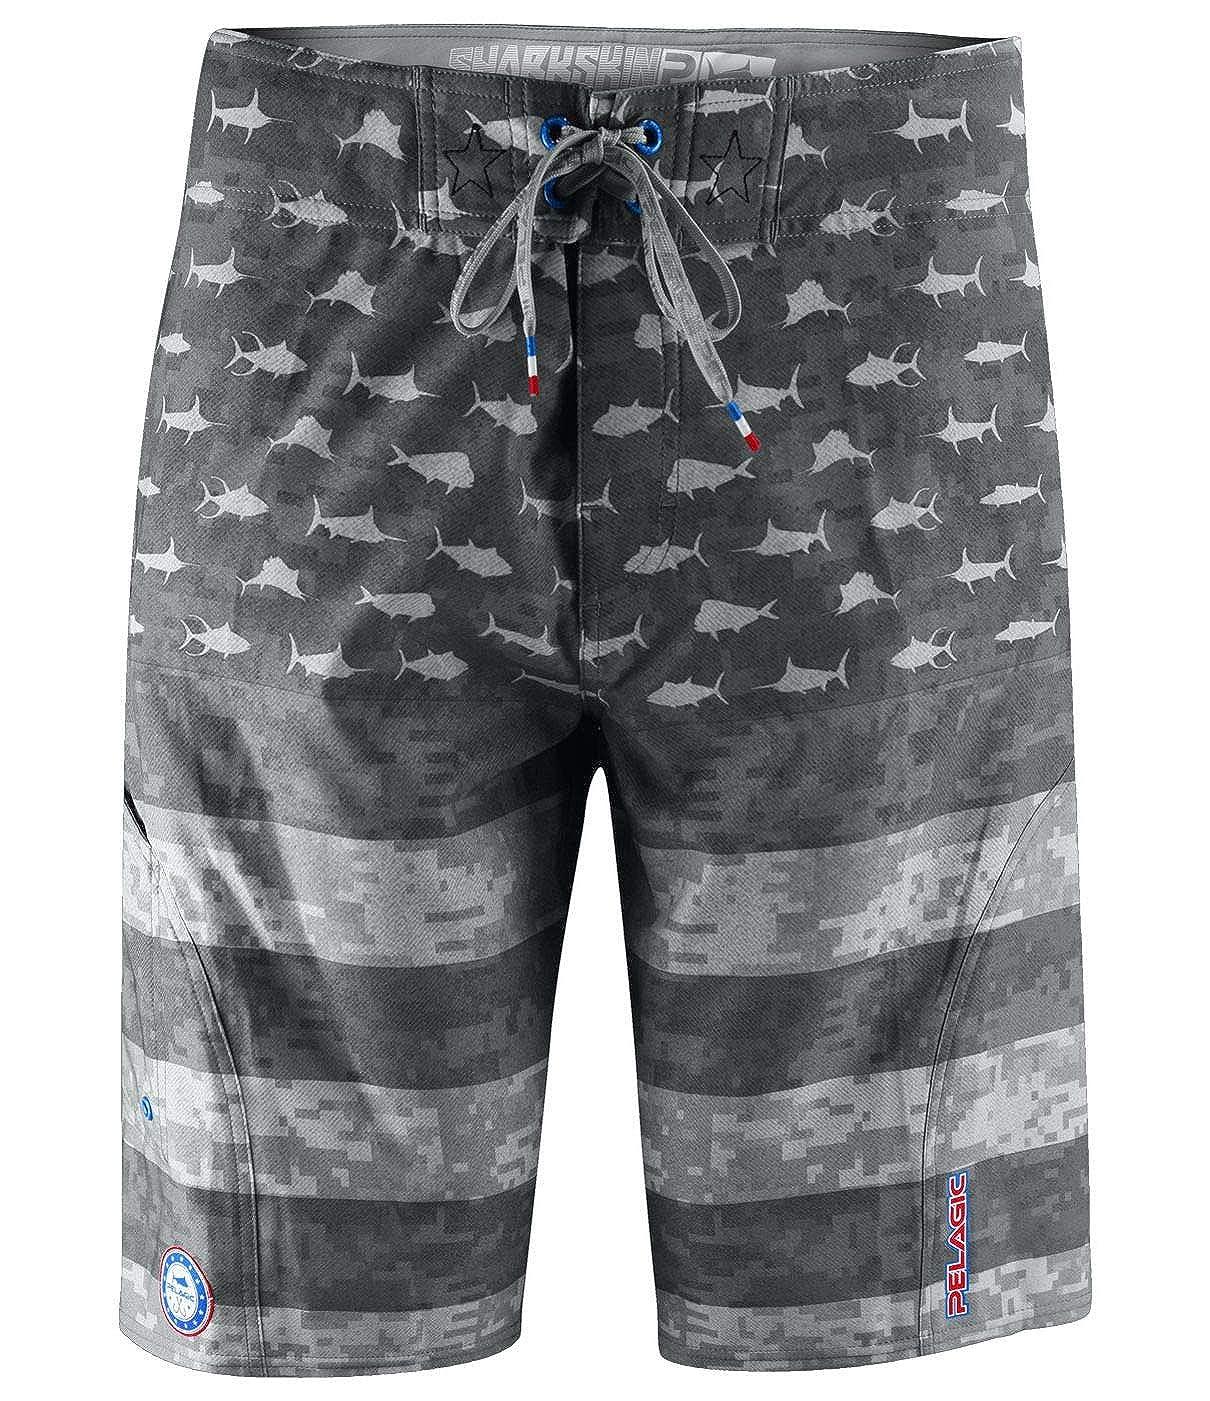 8f13d4ef8f5fd Amazon.com: Pelagic Men's Sharkskin Americamo Boardshort for Fishing |  American Flag Design: Sports & Outdoors